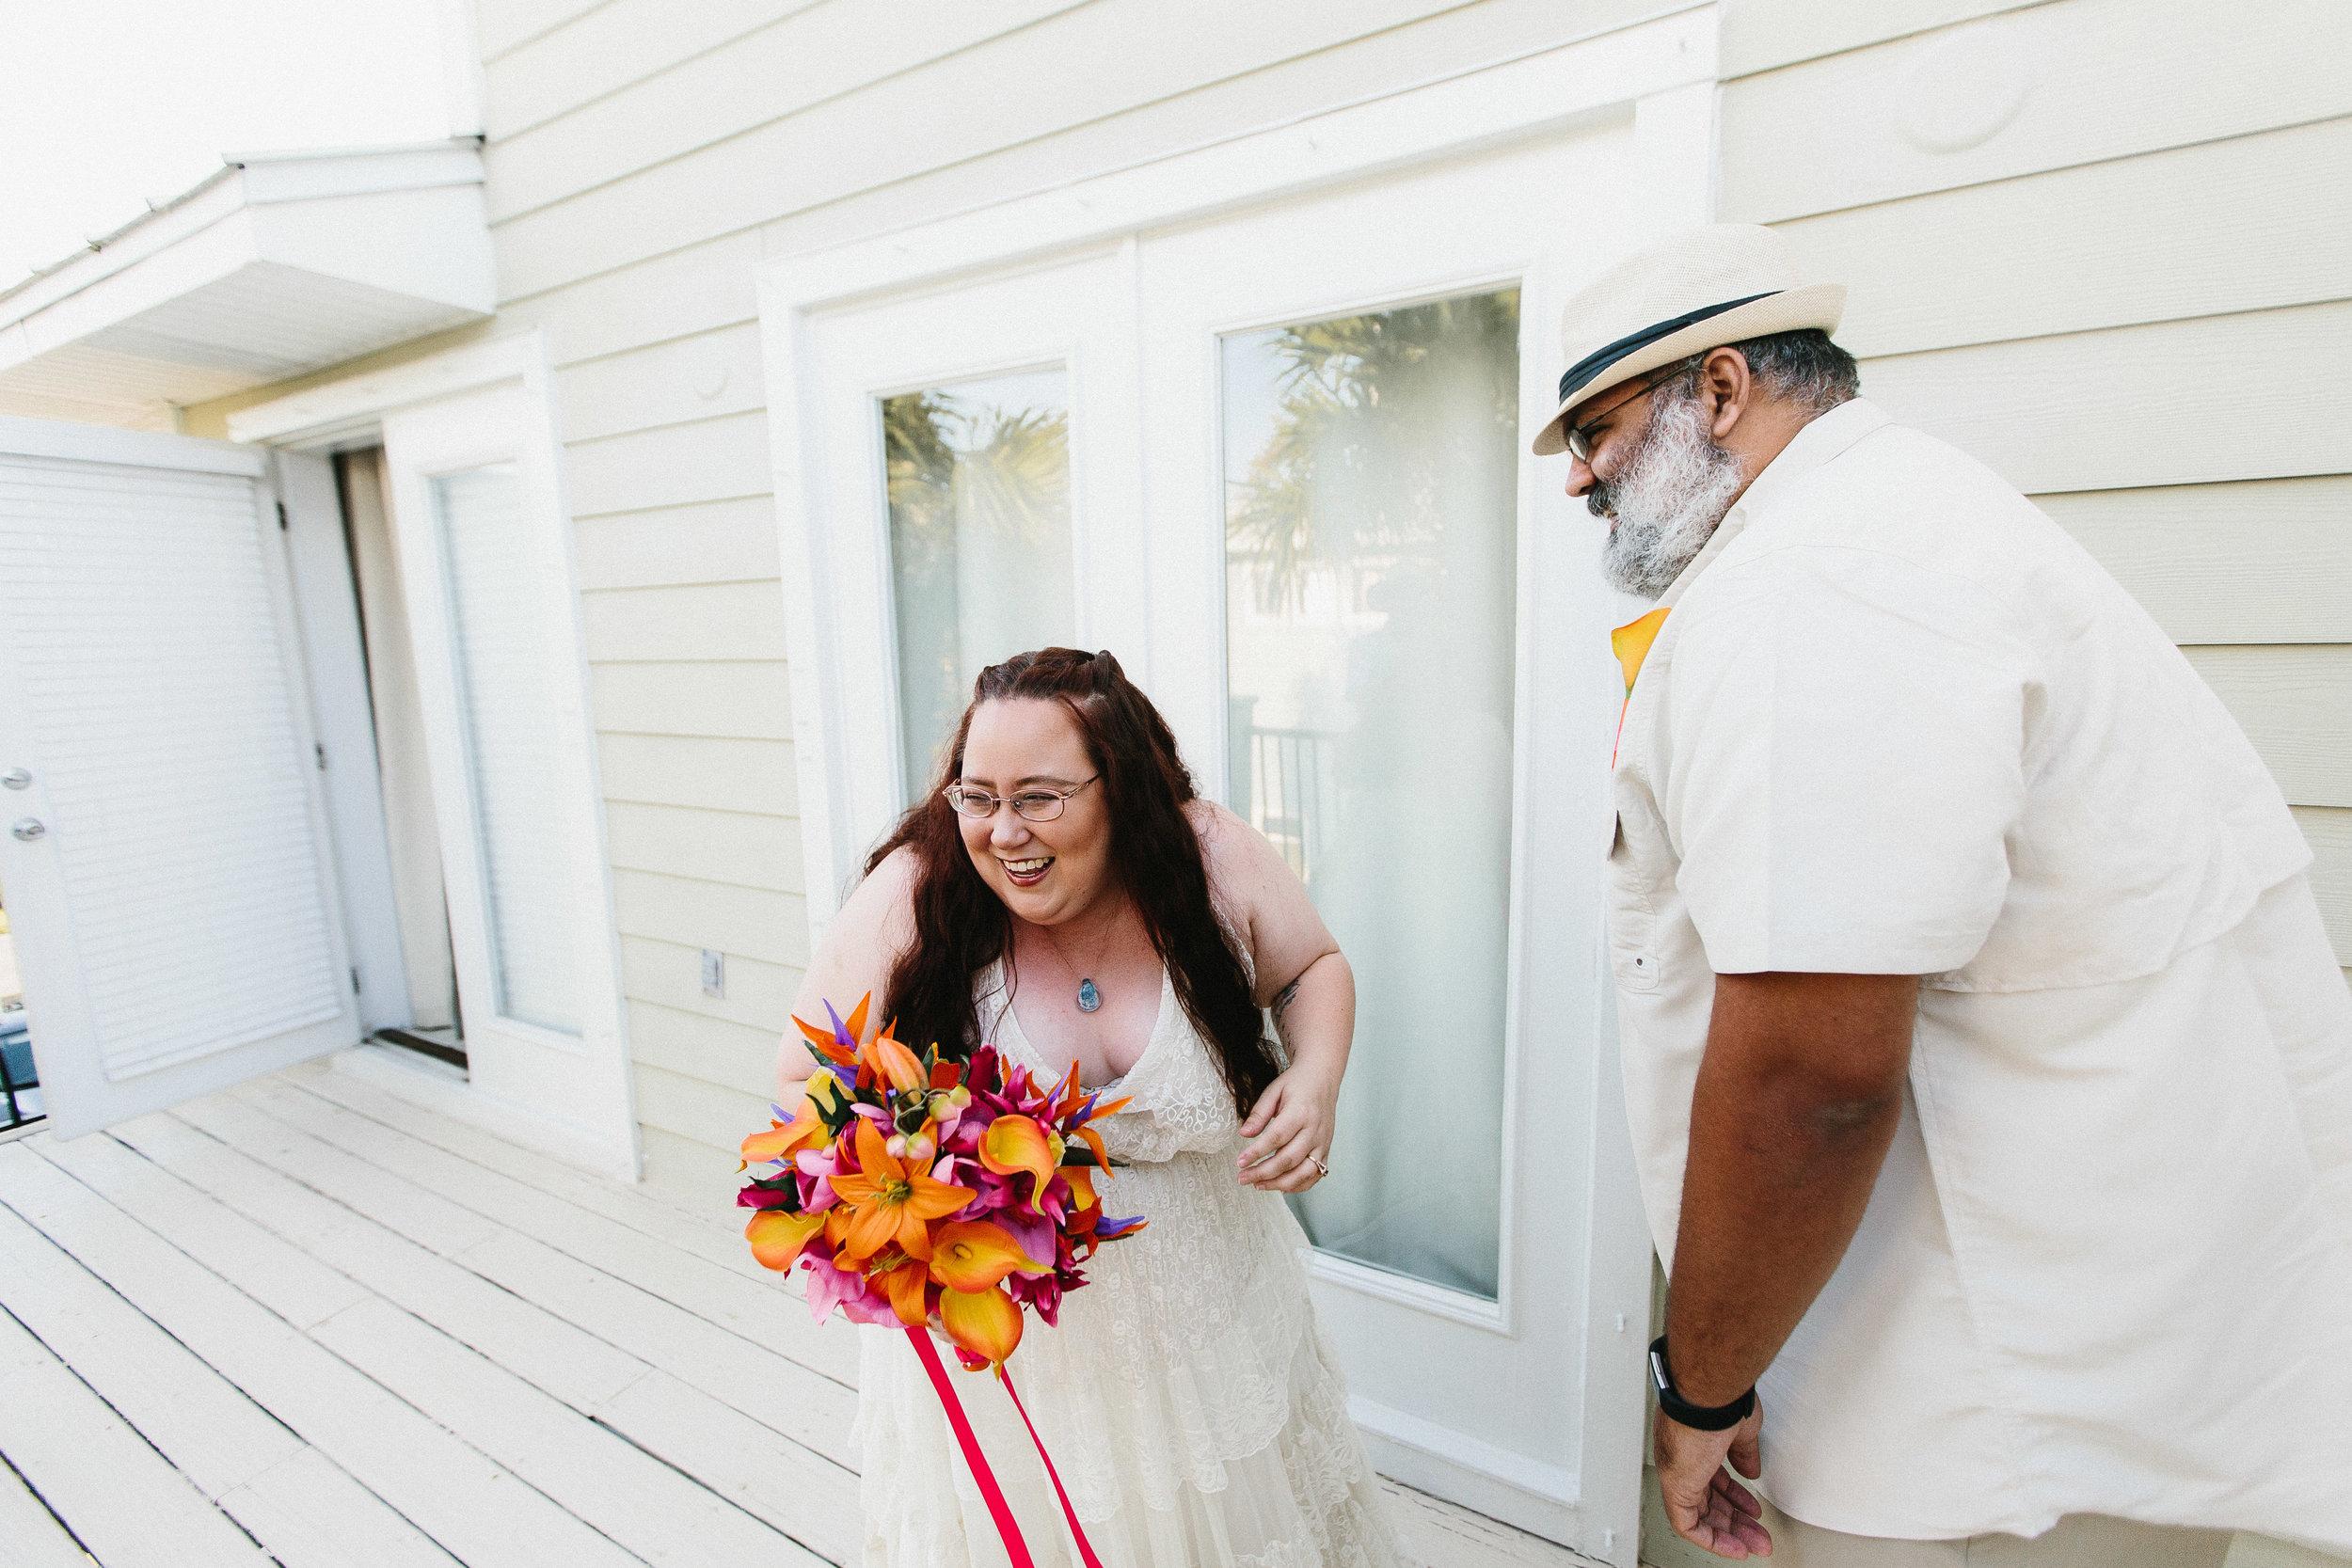 destin_sunset_beach_elopement_intimate_wedding_photographer_florida_documentary_1063.jpg